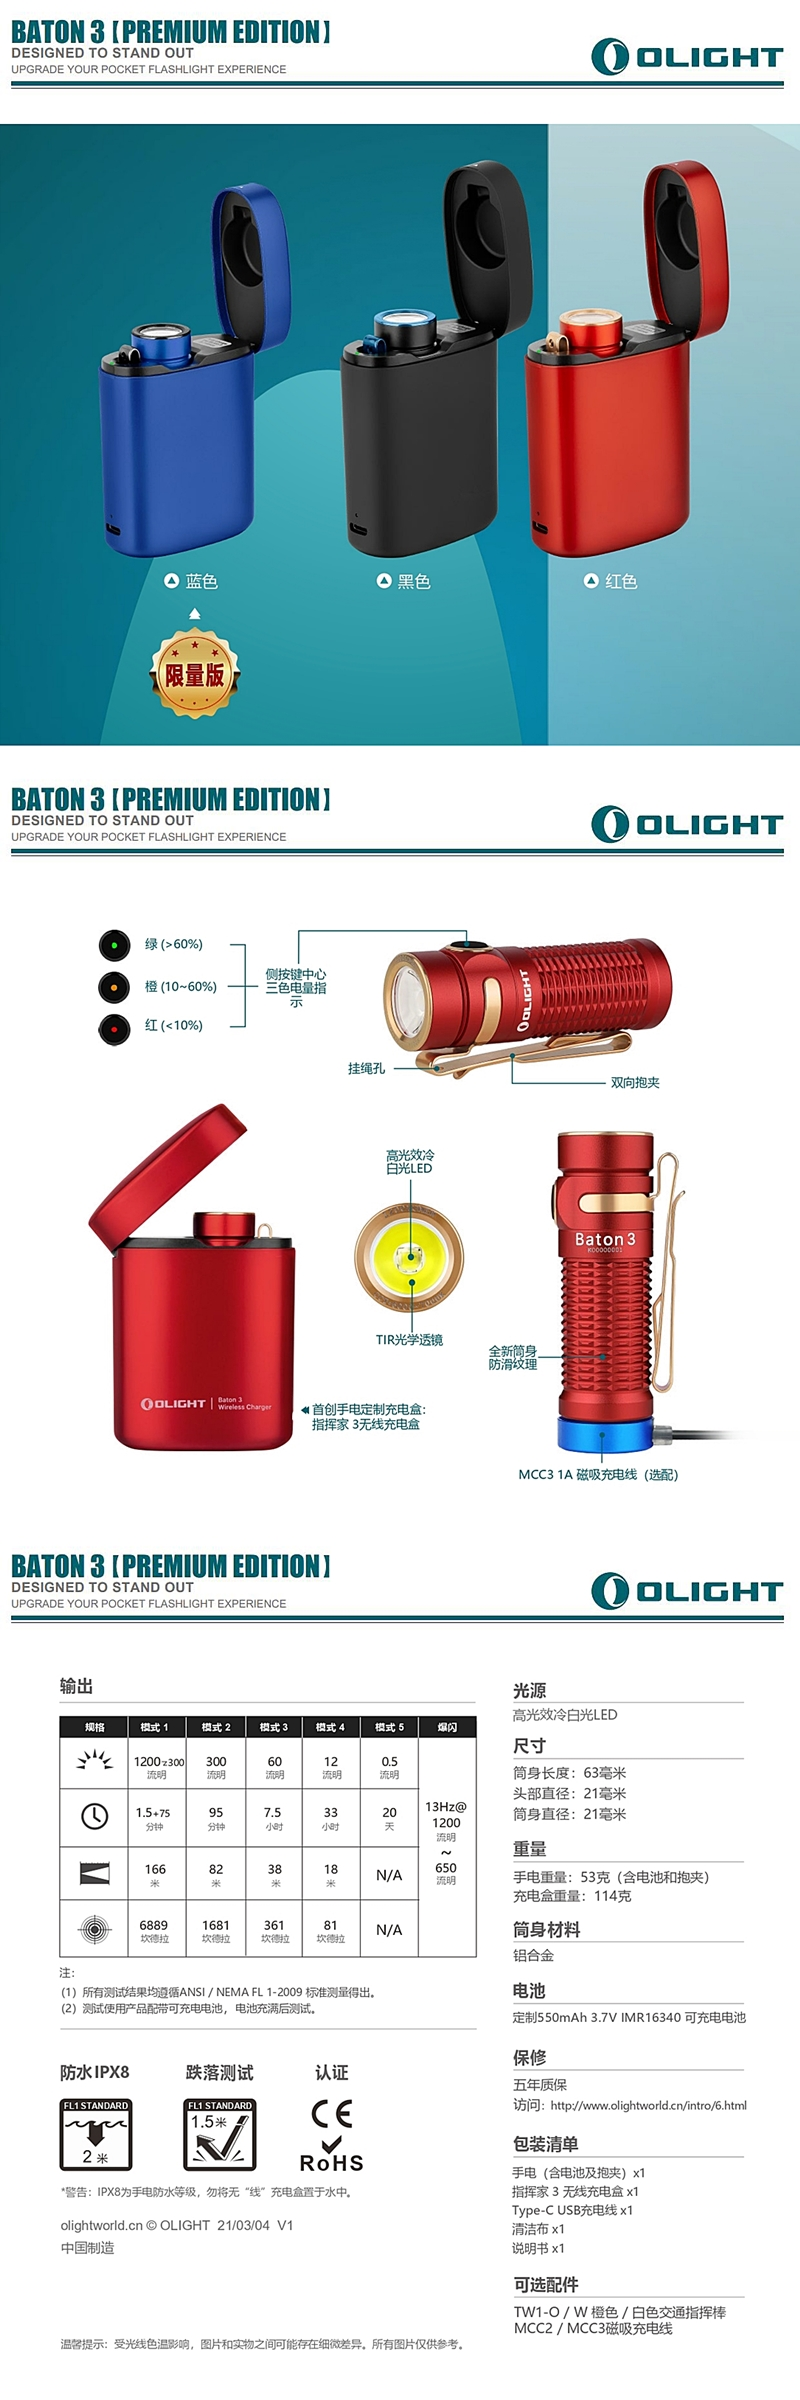 Olight Baton 3 Premium Edition  1,200 lumens powerful Baton 3 and portable wireless charger (2)